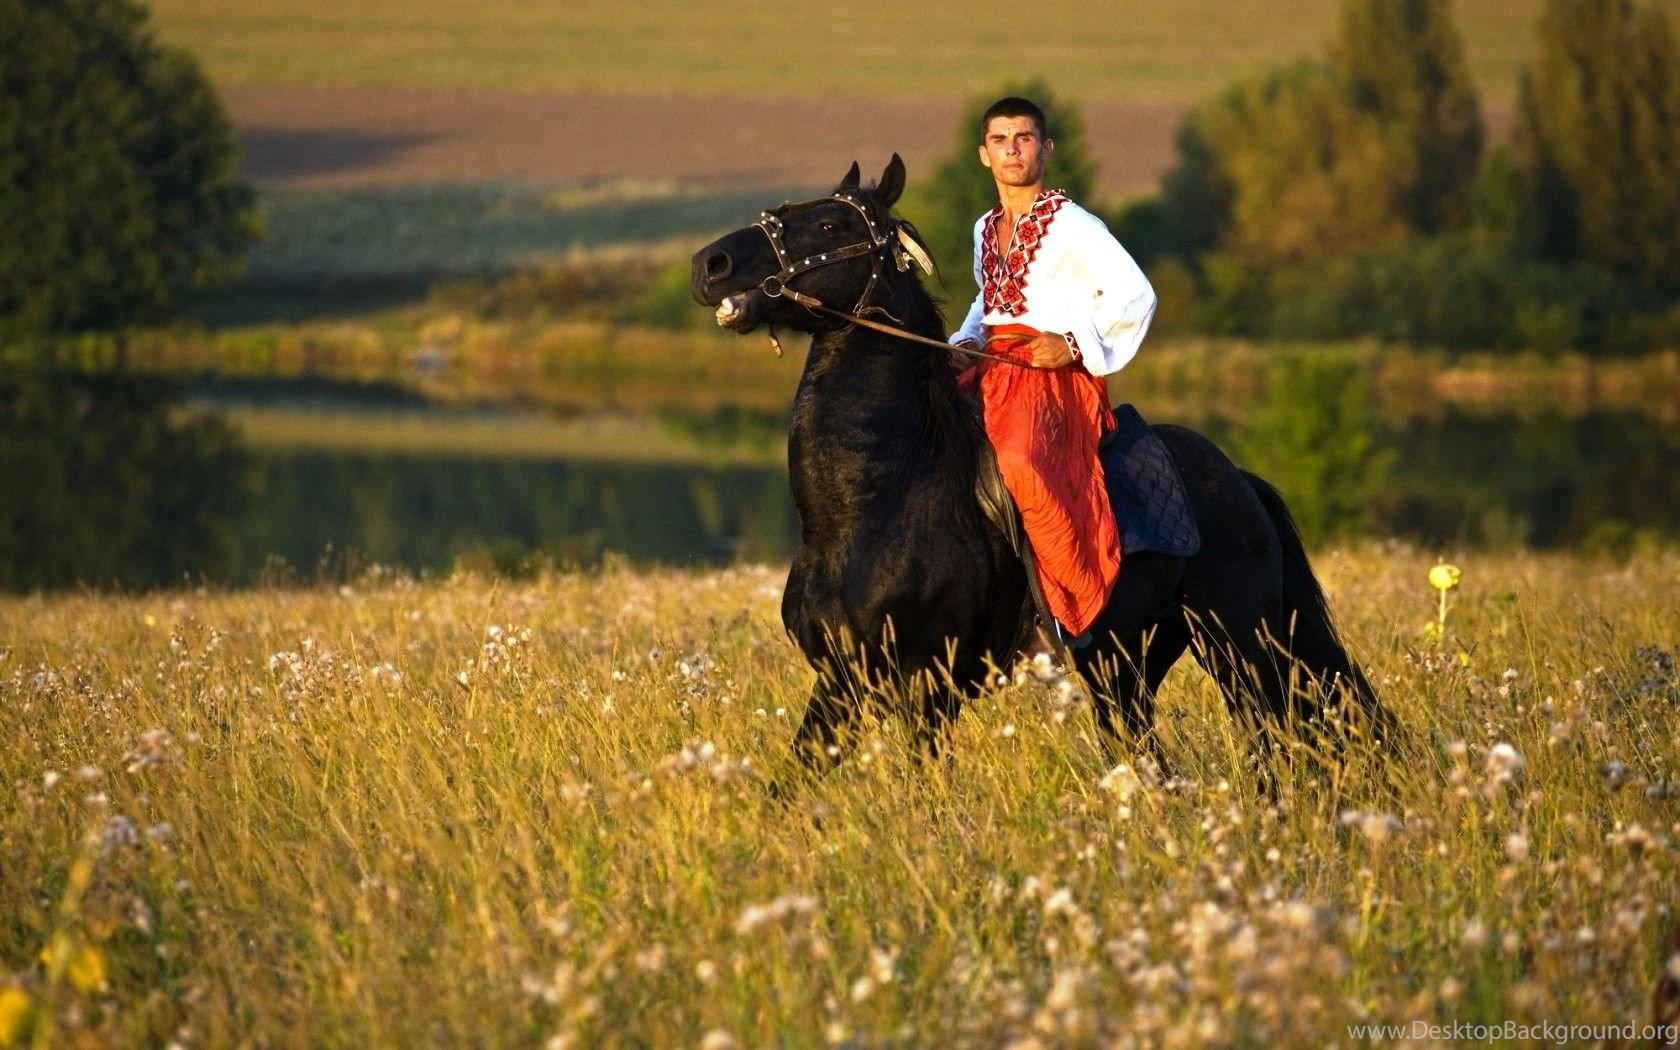 Black Stallion Man Horse Riding Horses Wallpaper Backgrounds Free Desktop Background